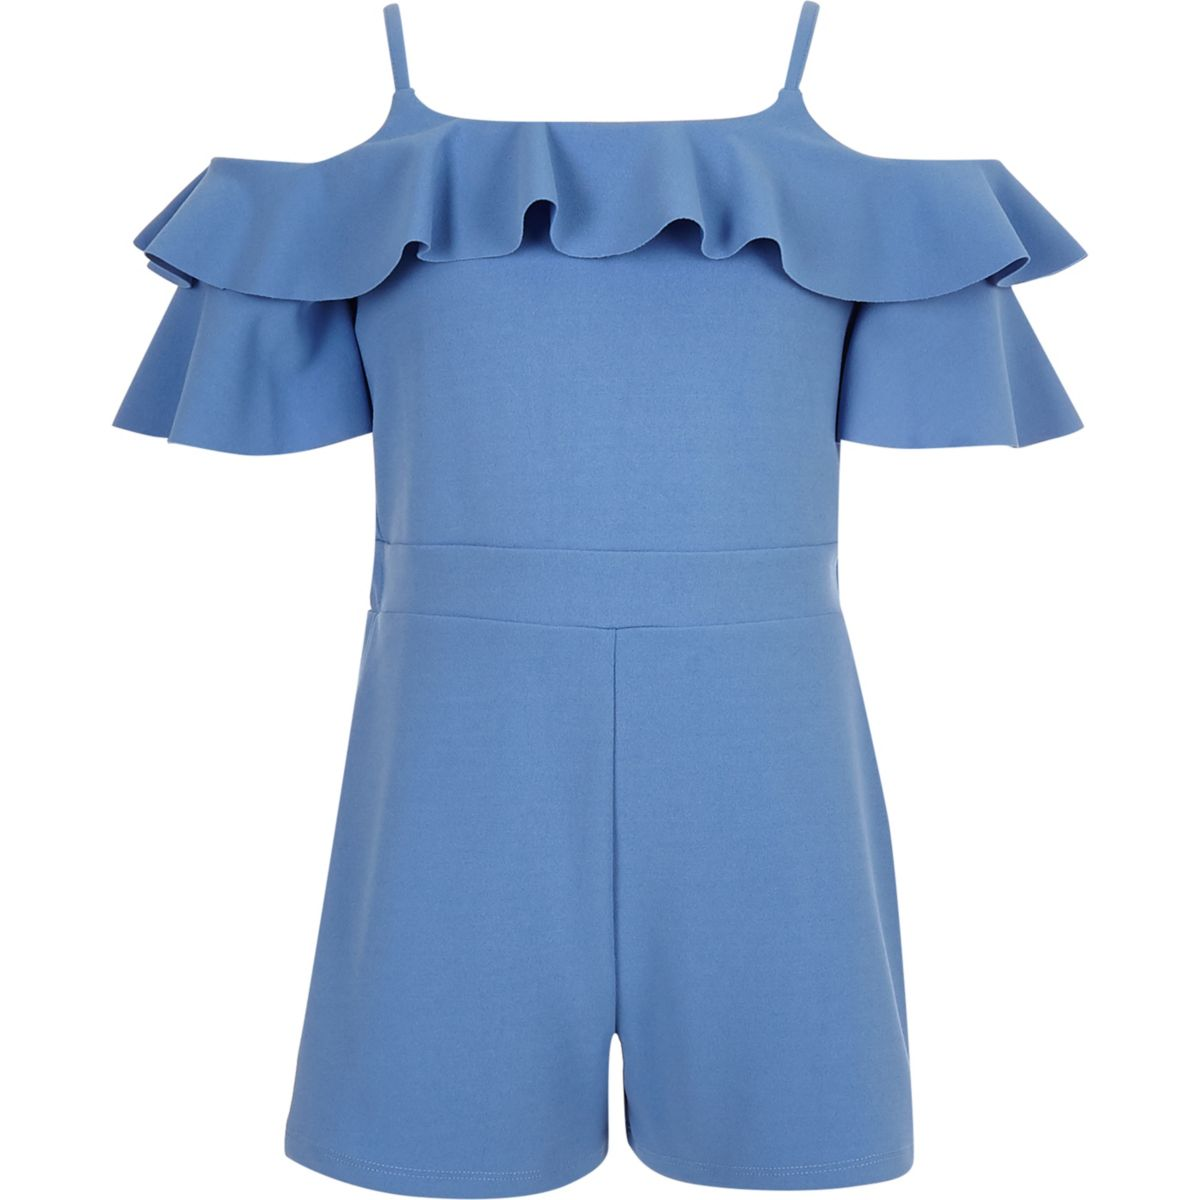 Girls blue cold shoulder ruffle romper